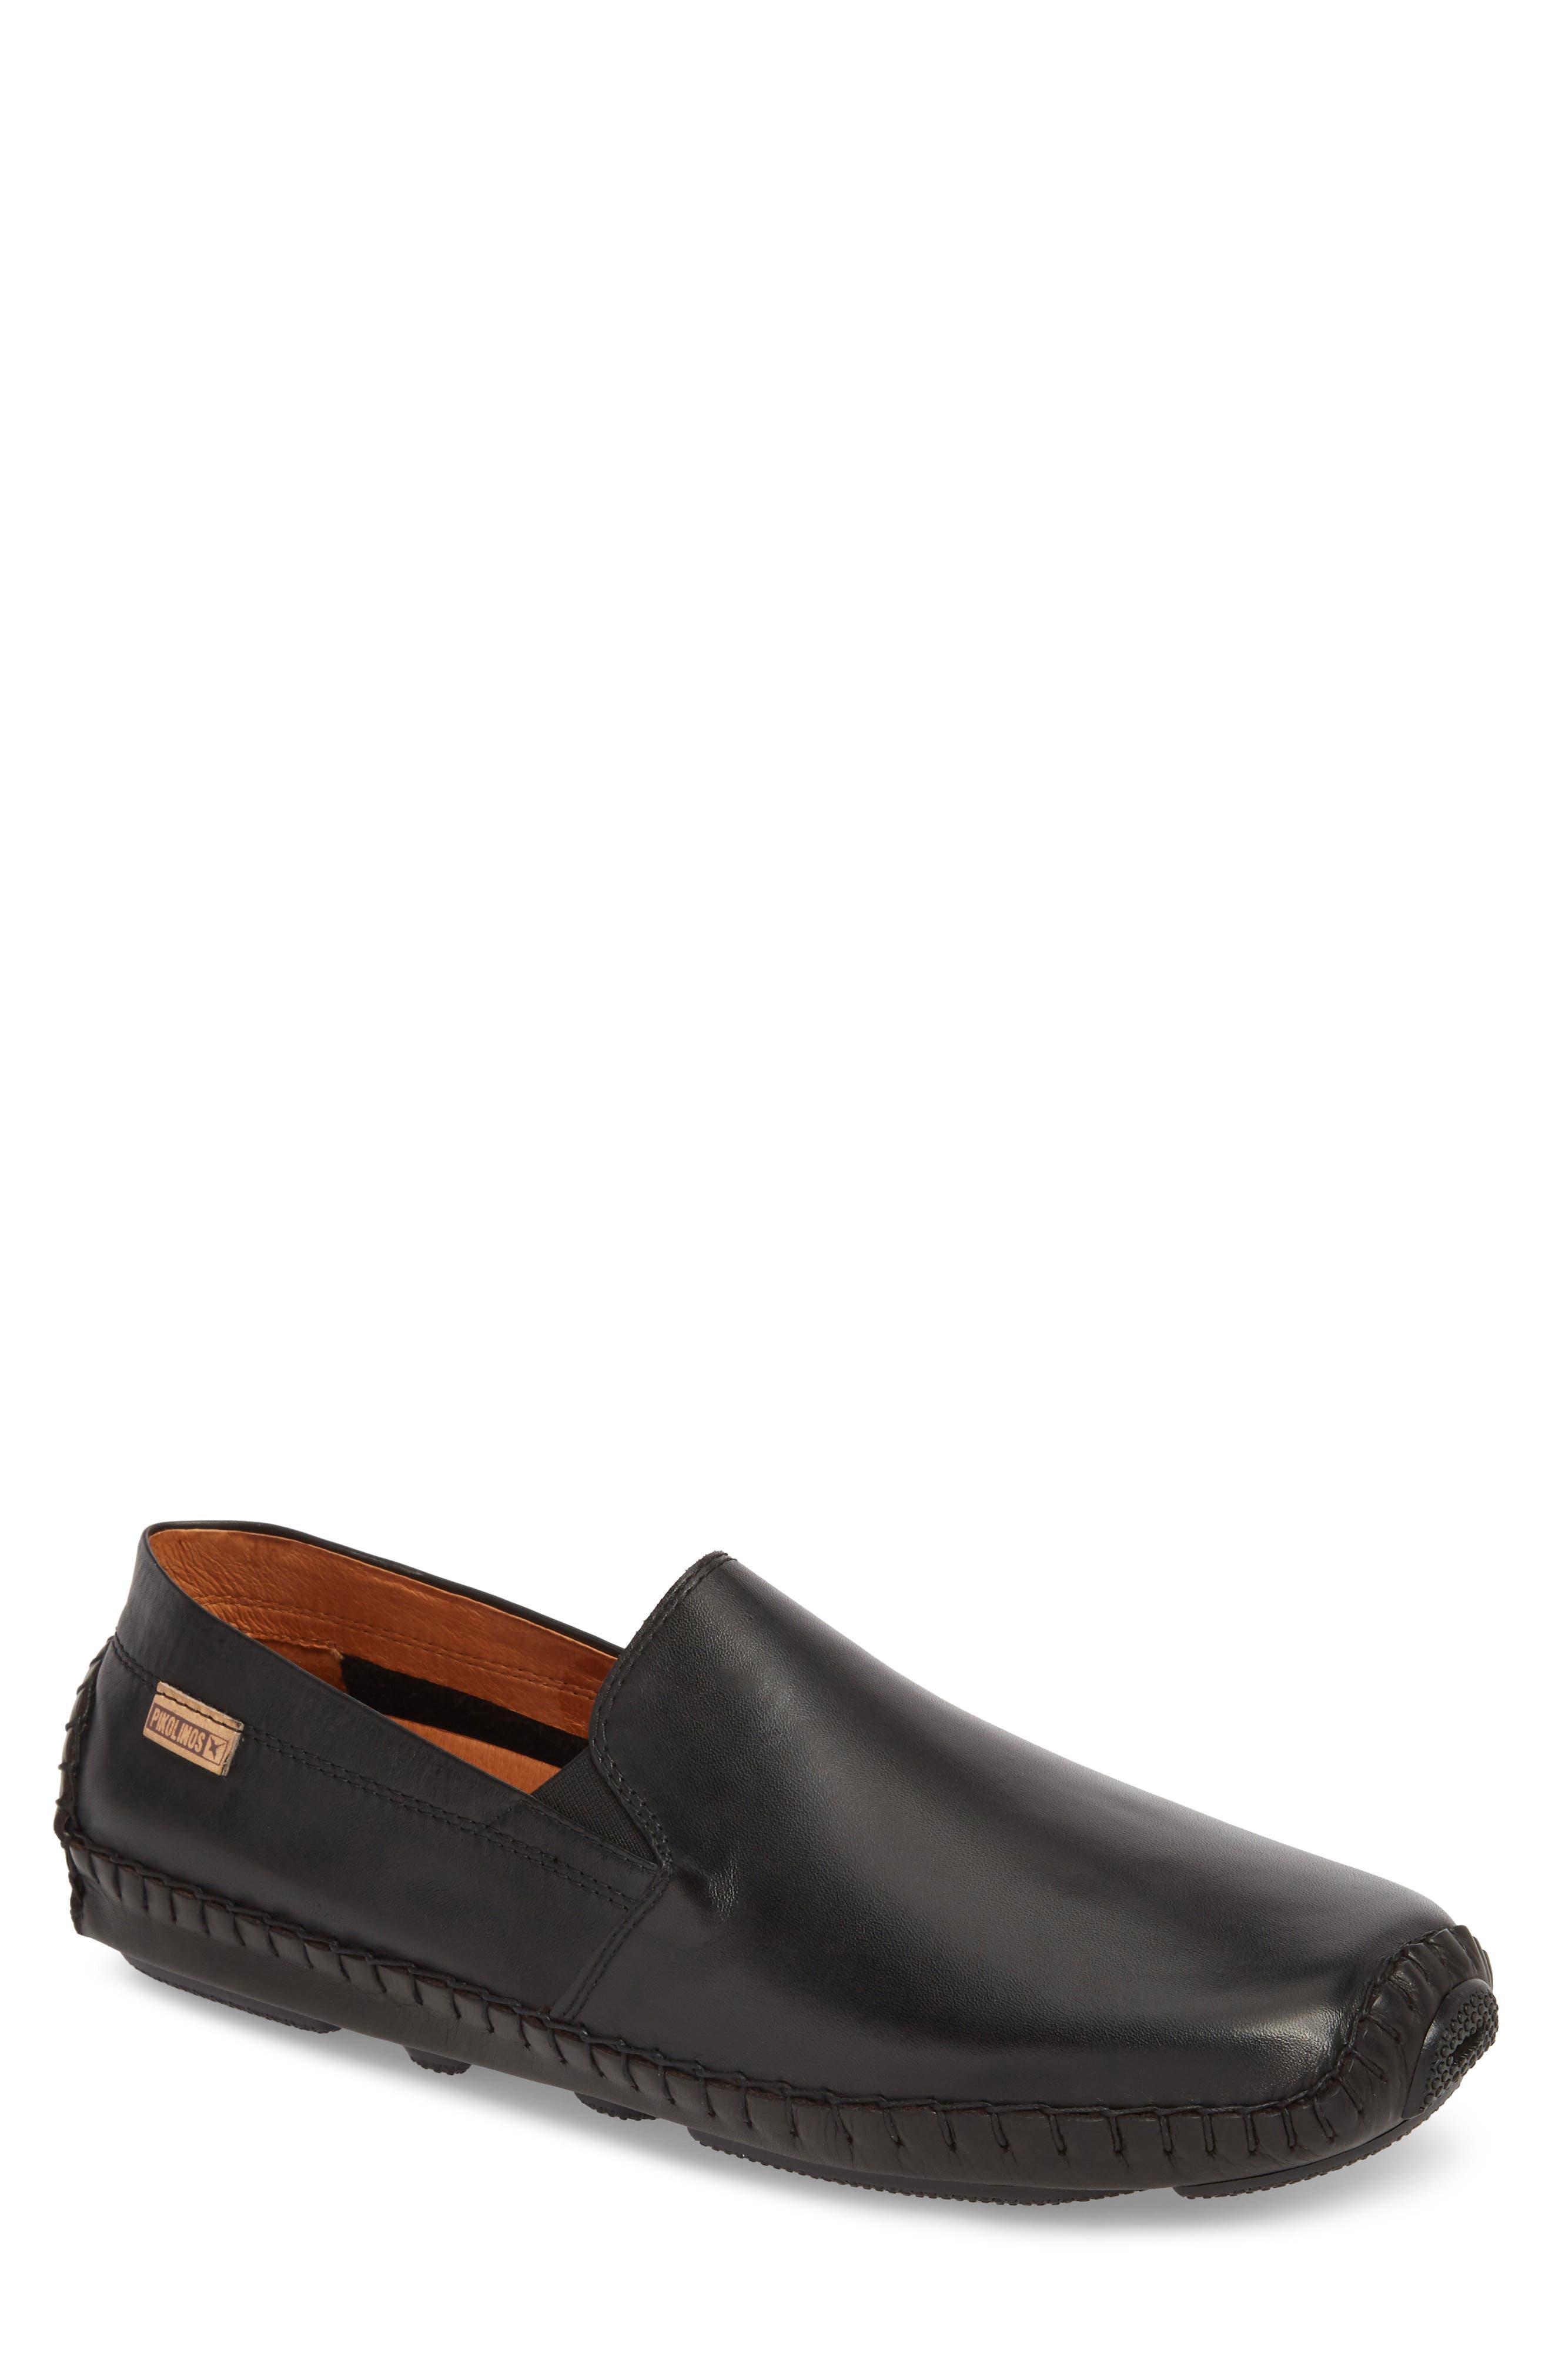 Jerez Driving Shoe,                             Main thumbnail 1, color,                             BLACK LEATHER